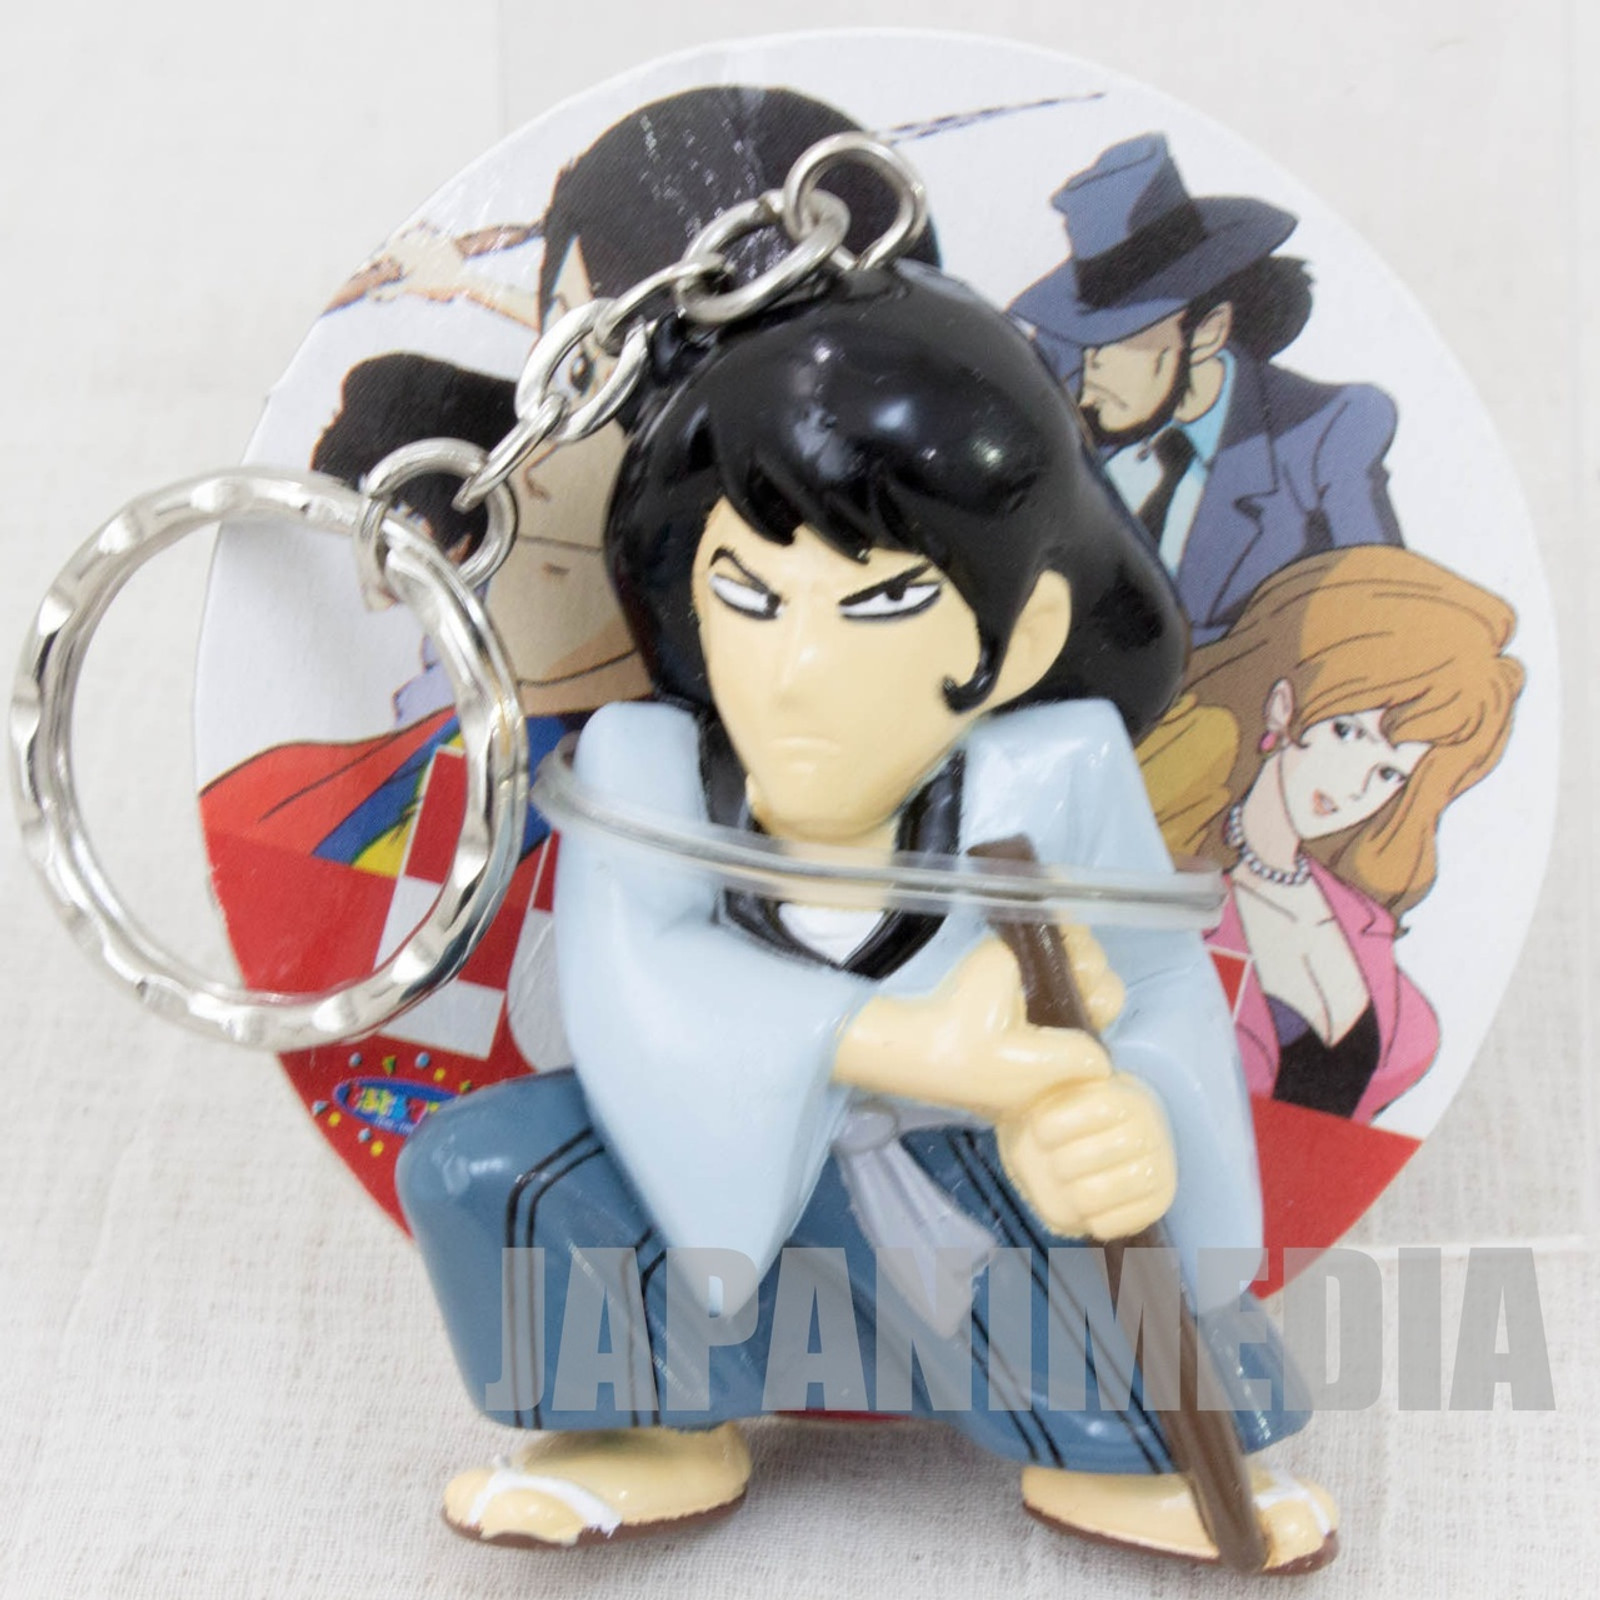 Lupin the Third (3rd) Goemon Ishikawa Figure Keychain Banpresto JAPAN ANIME MANGA